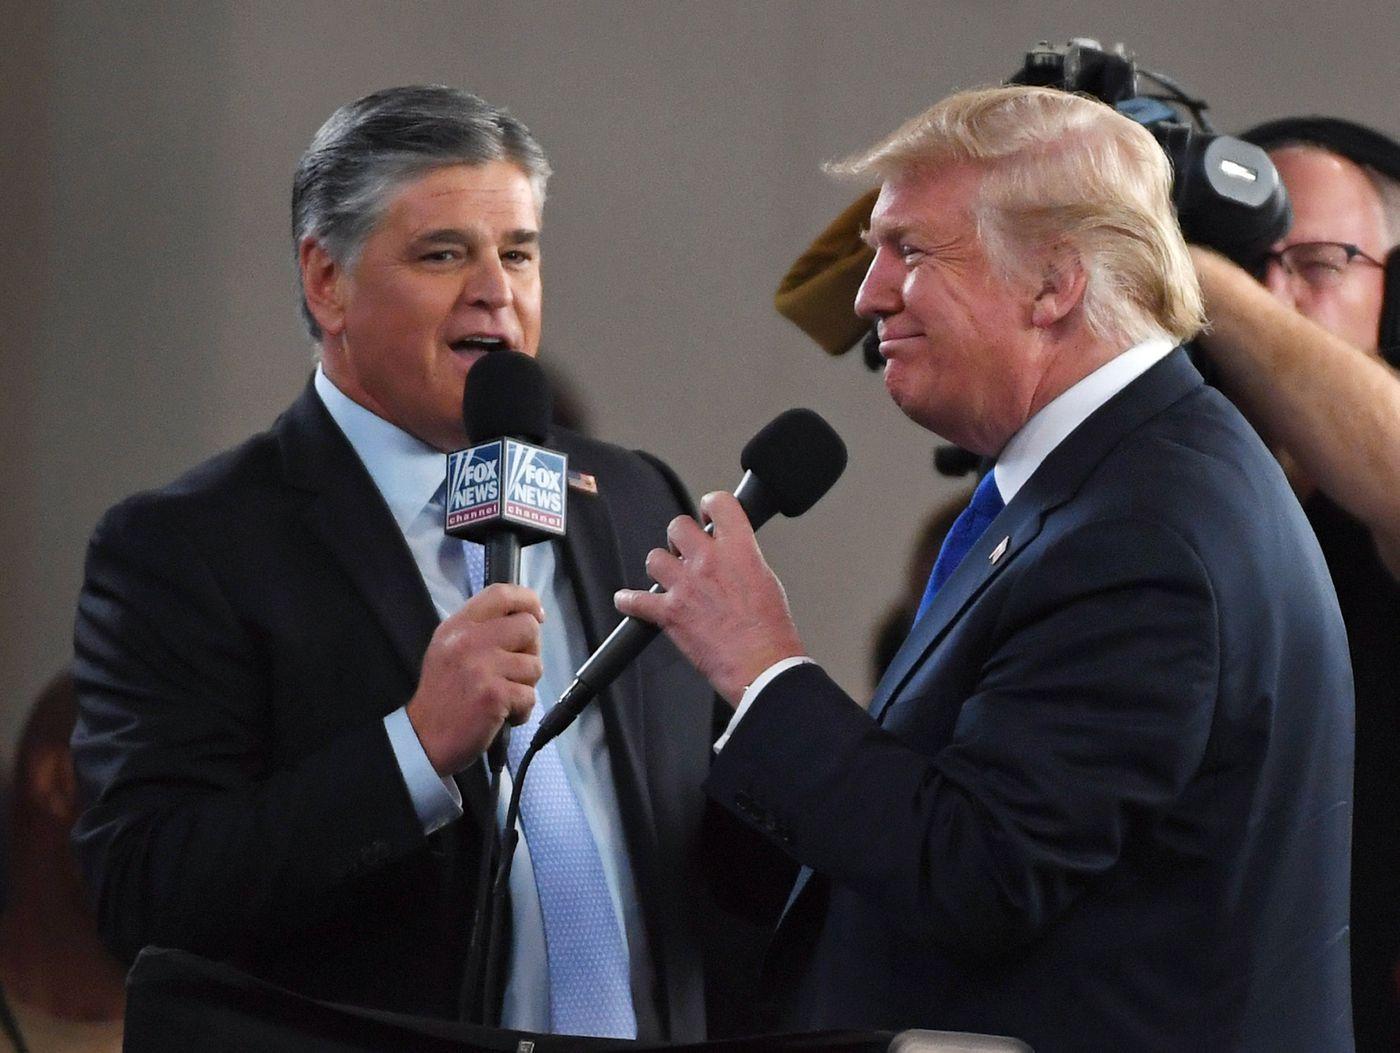 Trump and Fox News: how a partisan network became a propaganda